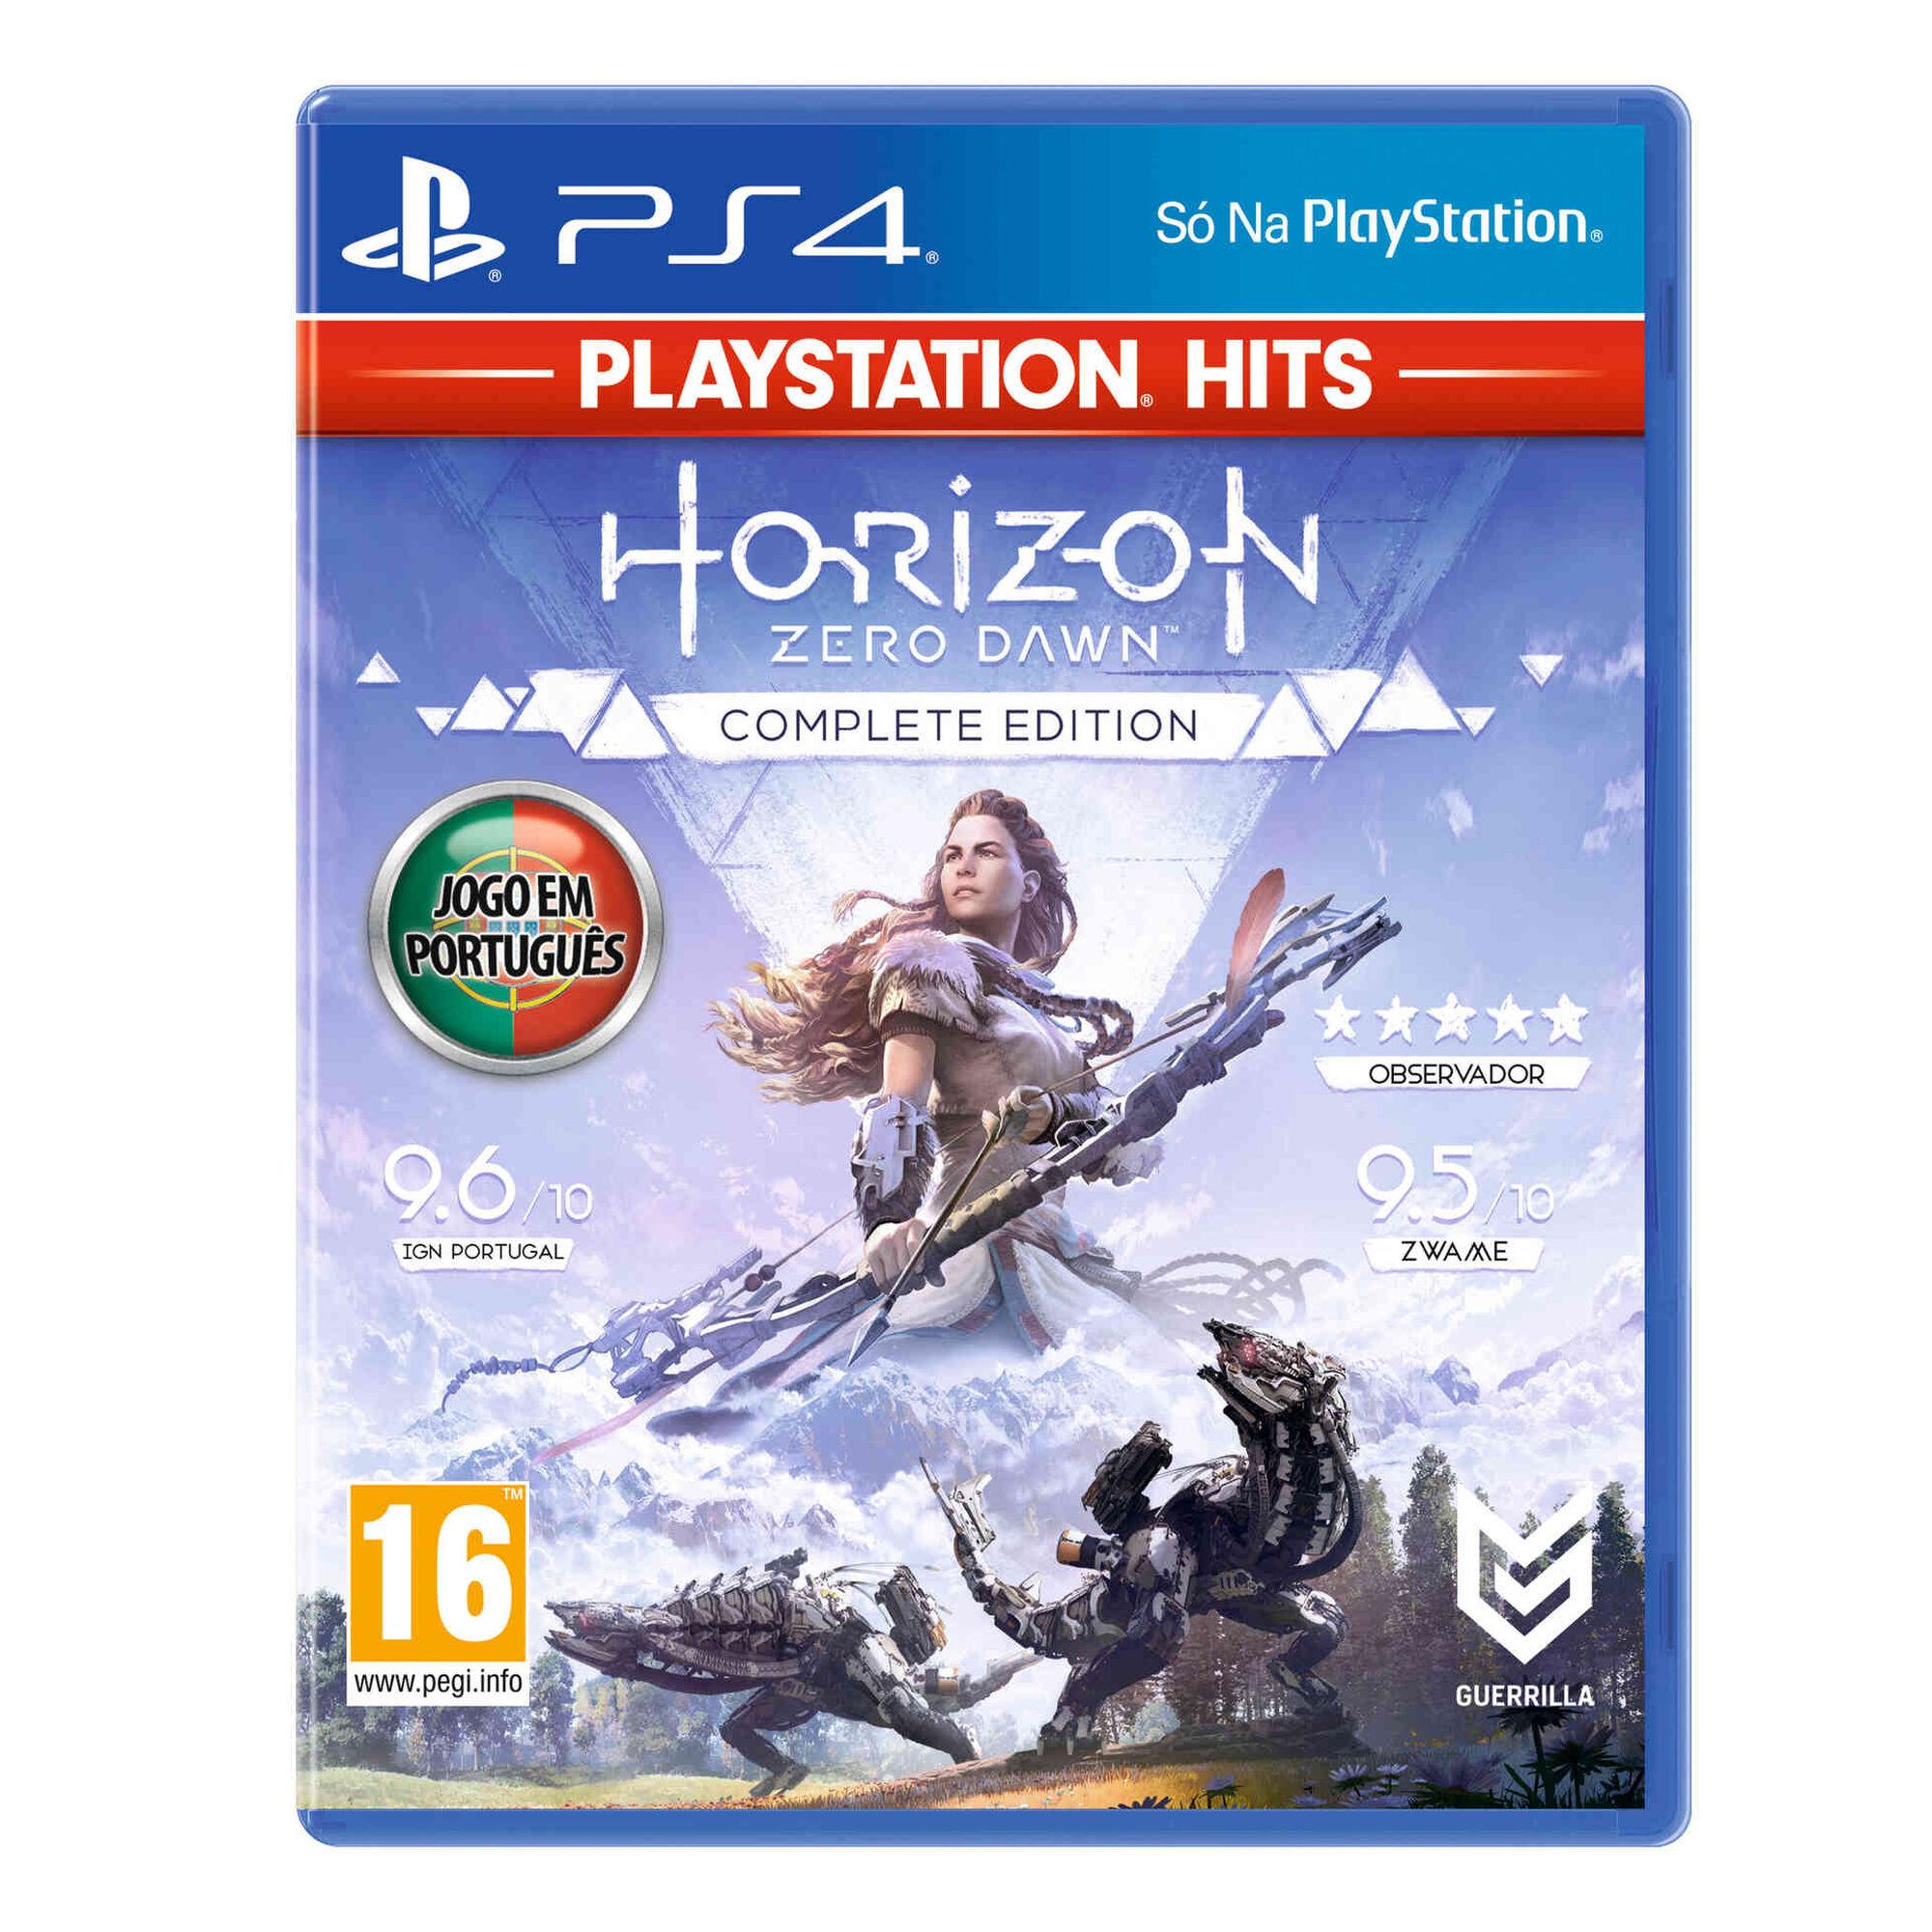 Jogo Sony PS4 Horizon Zero Down Hits